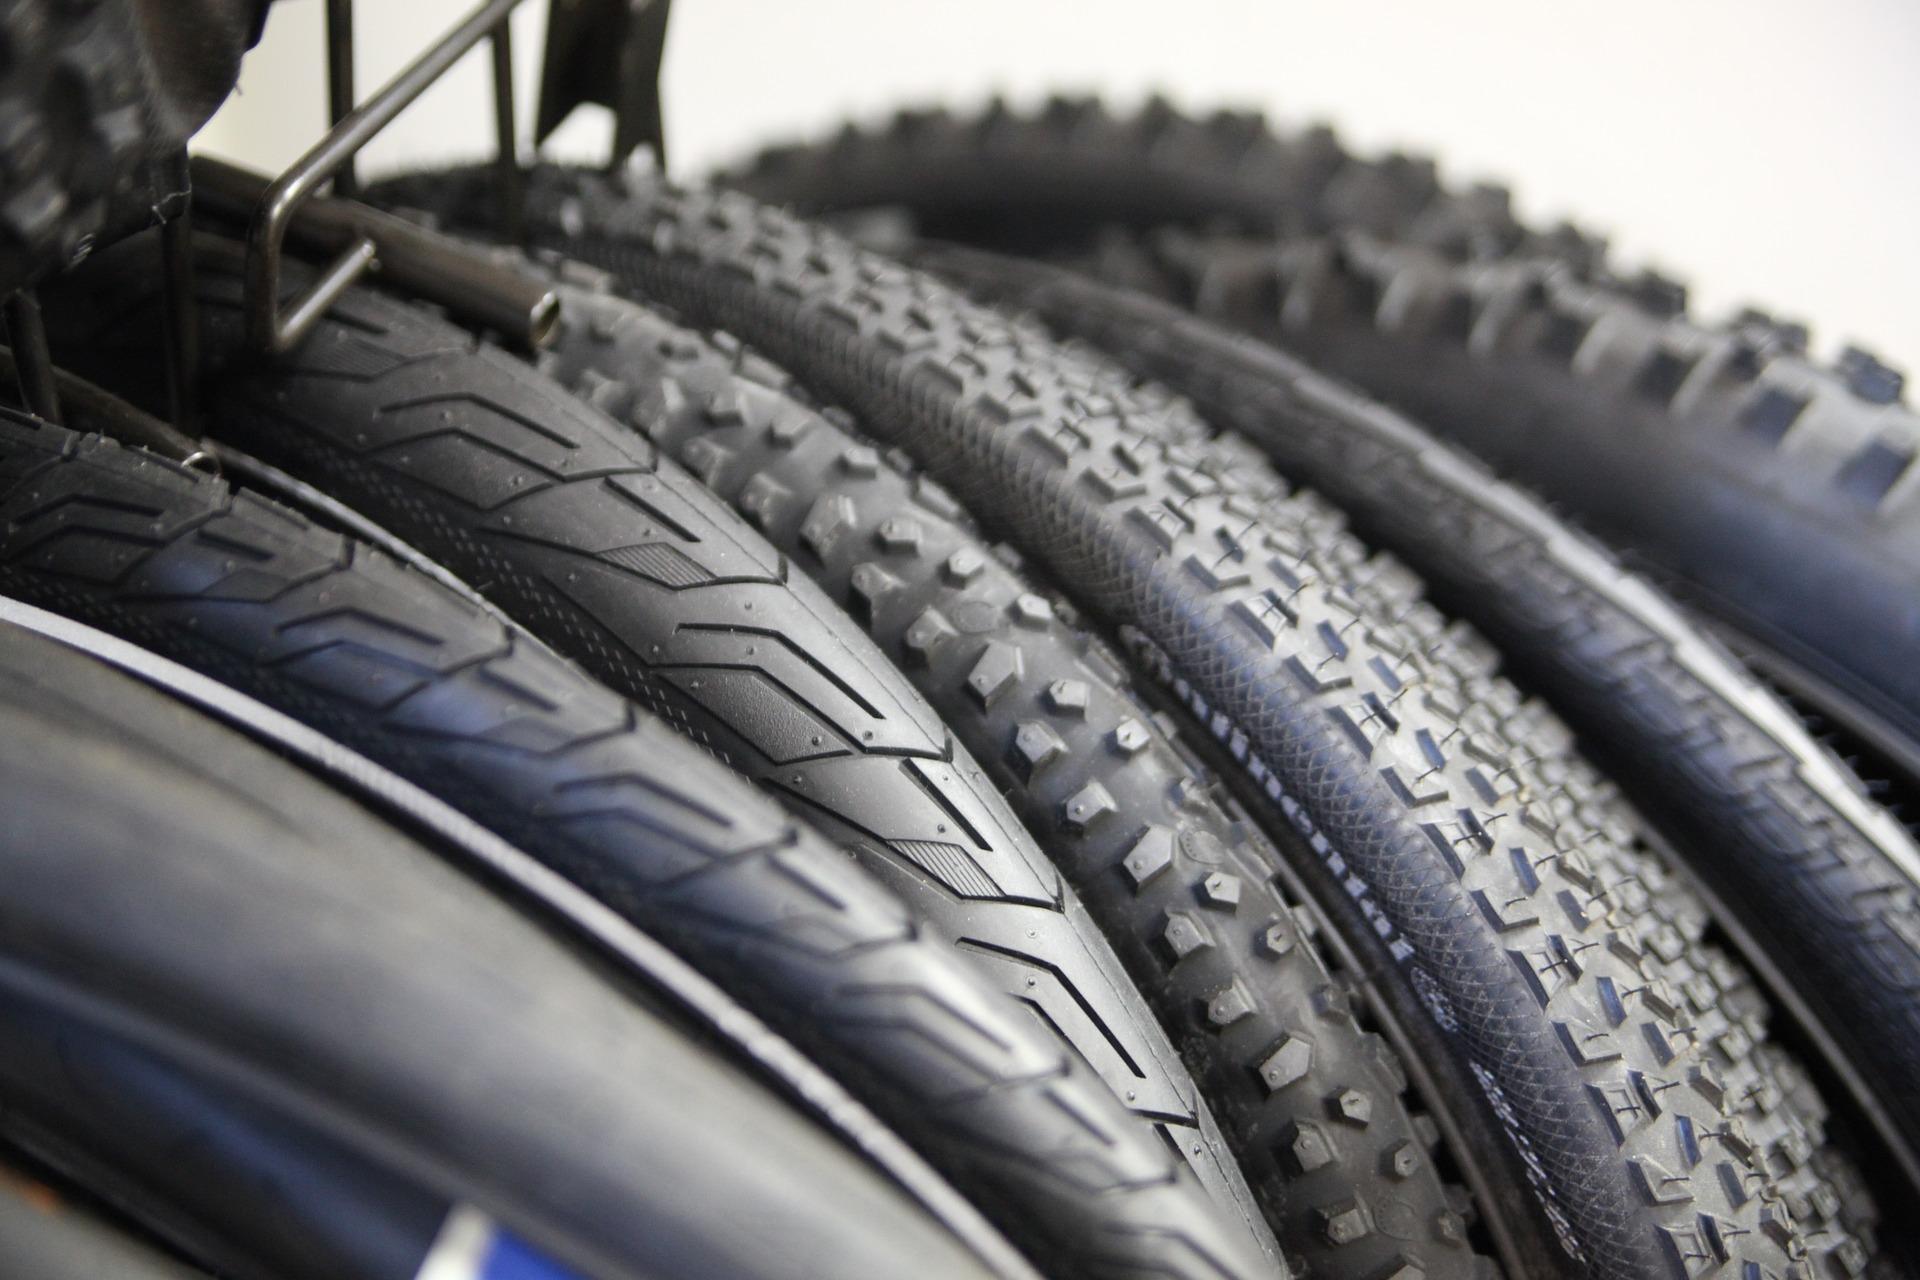 a close up tyres